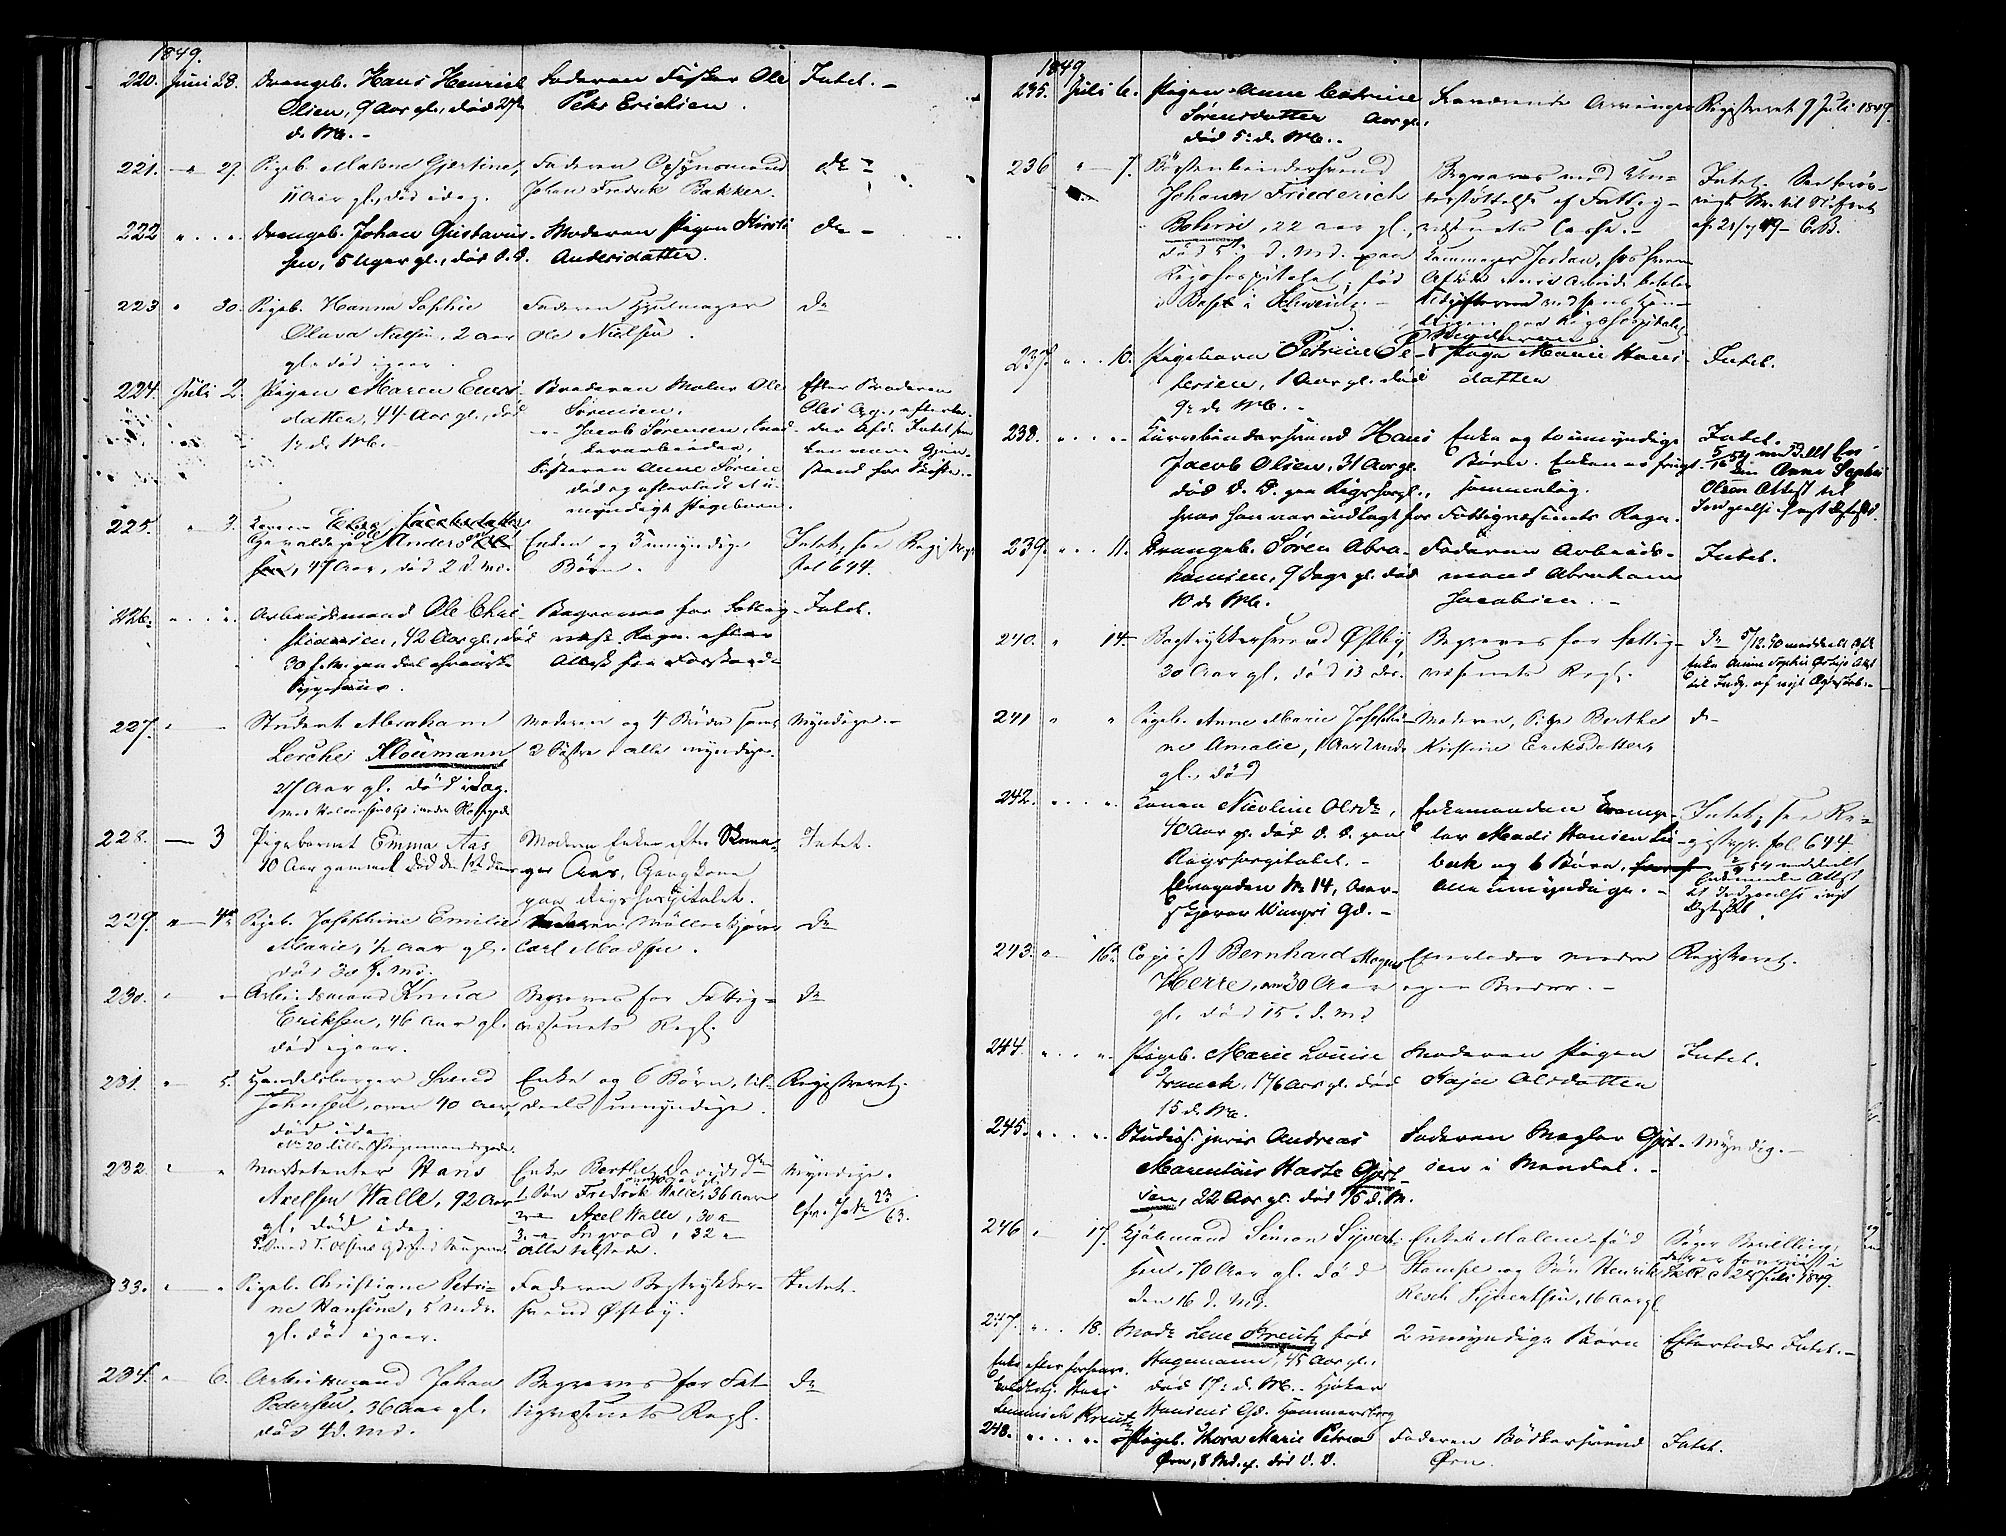 SAO, Oslo skifterett, G/Ga/Gaa/L0004: Dødsfallsprotokoll, 1846-1853, s. upaginert